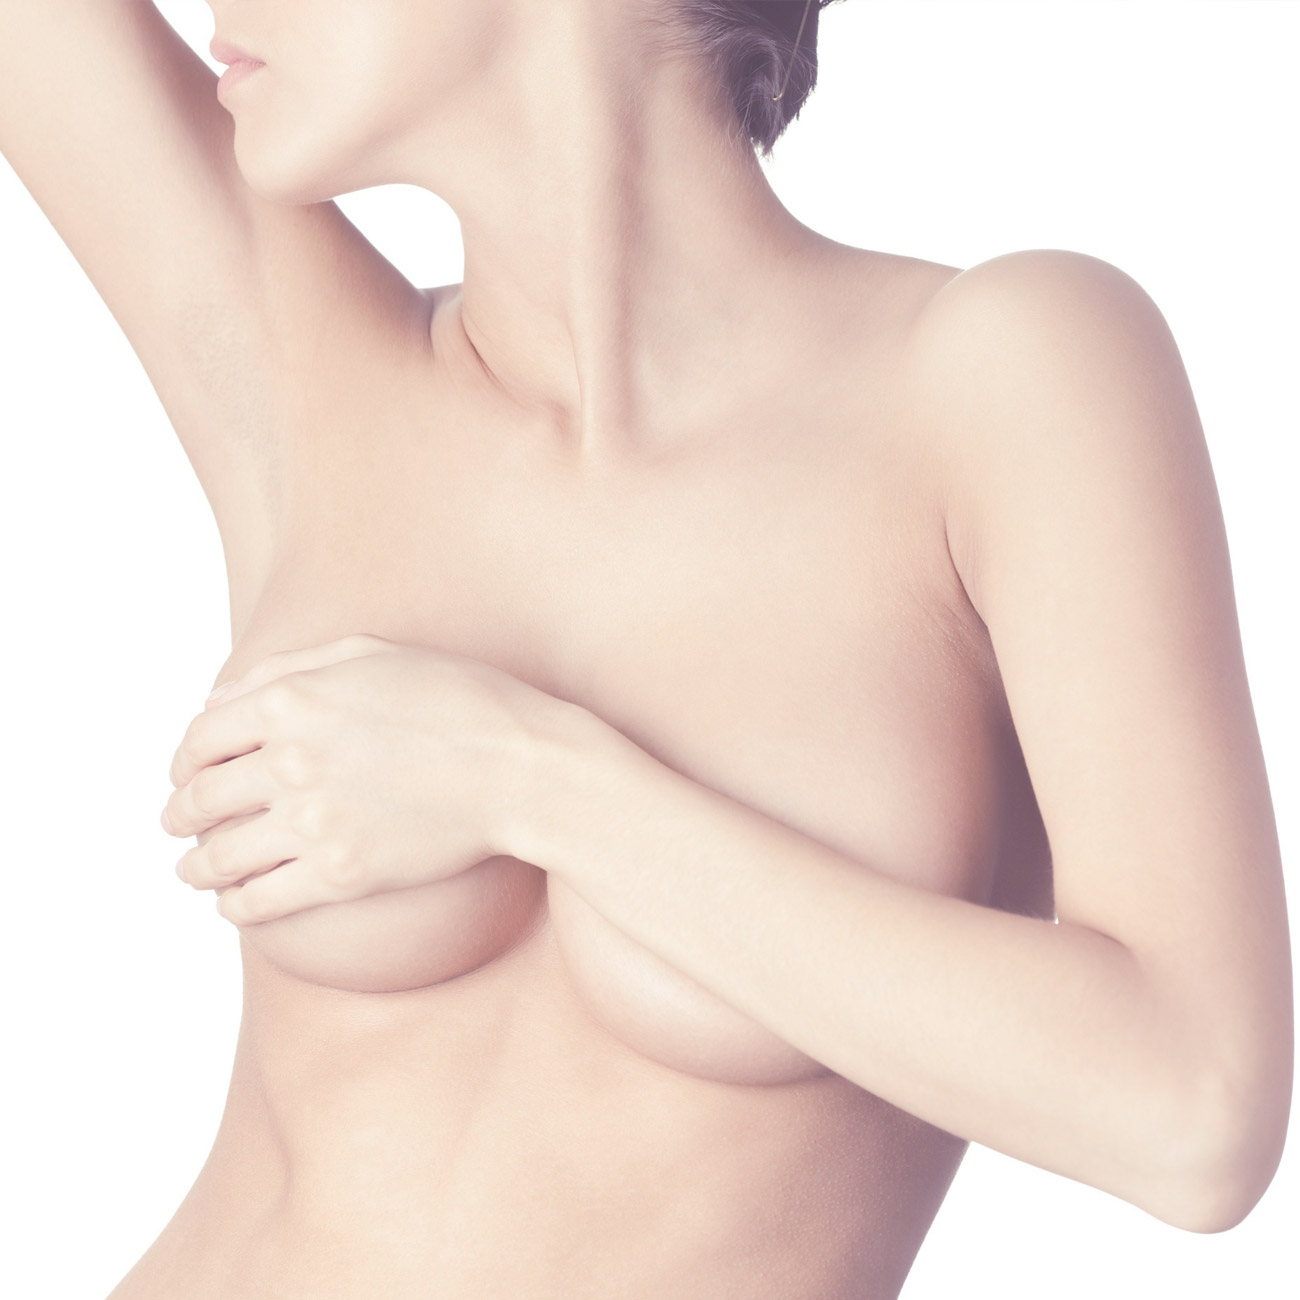 aumentos de senos